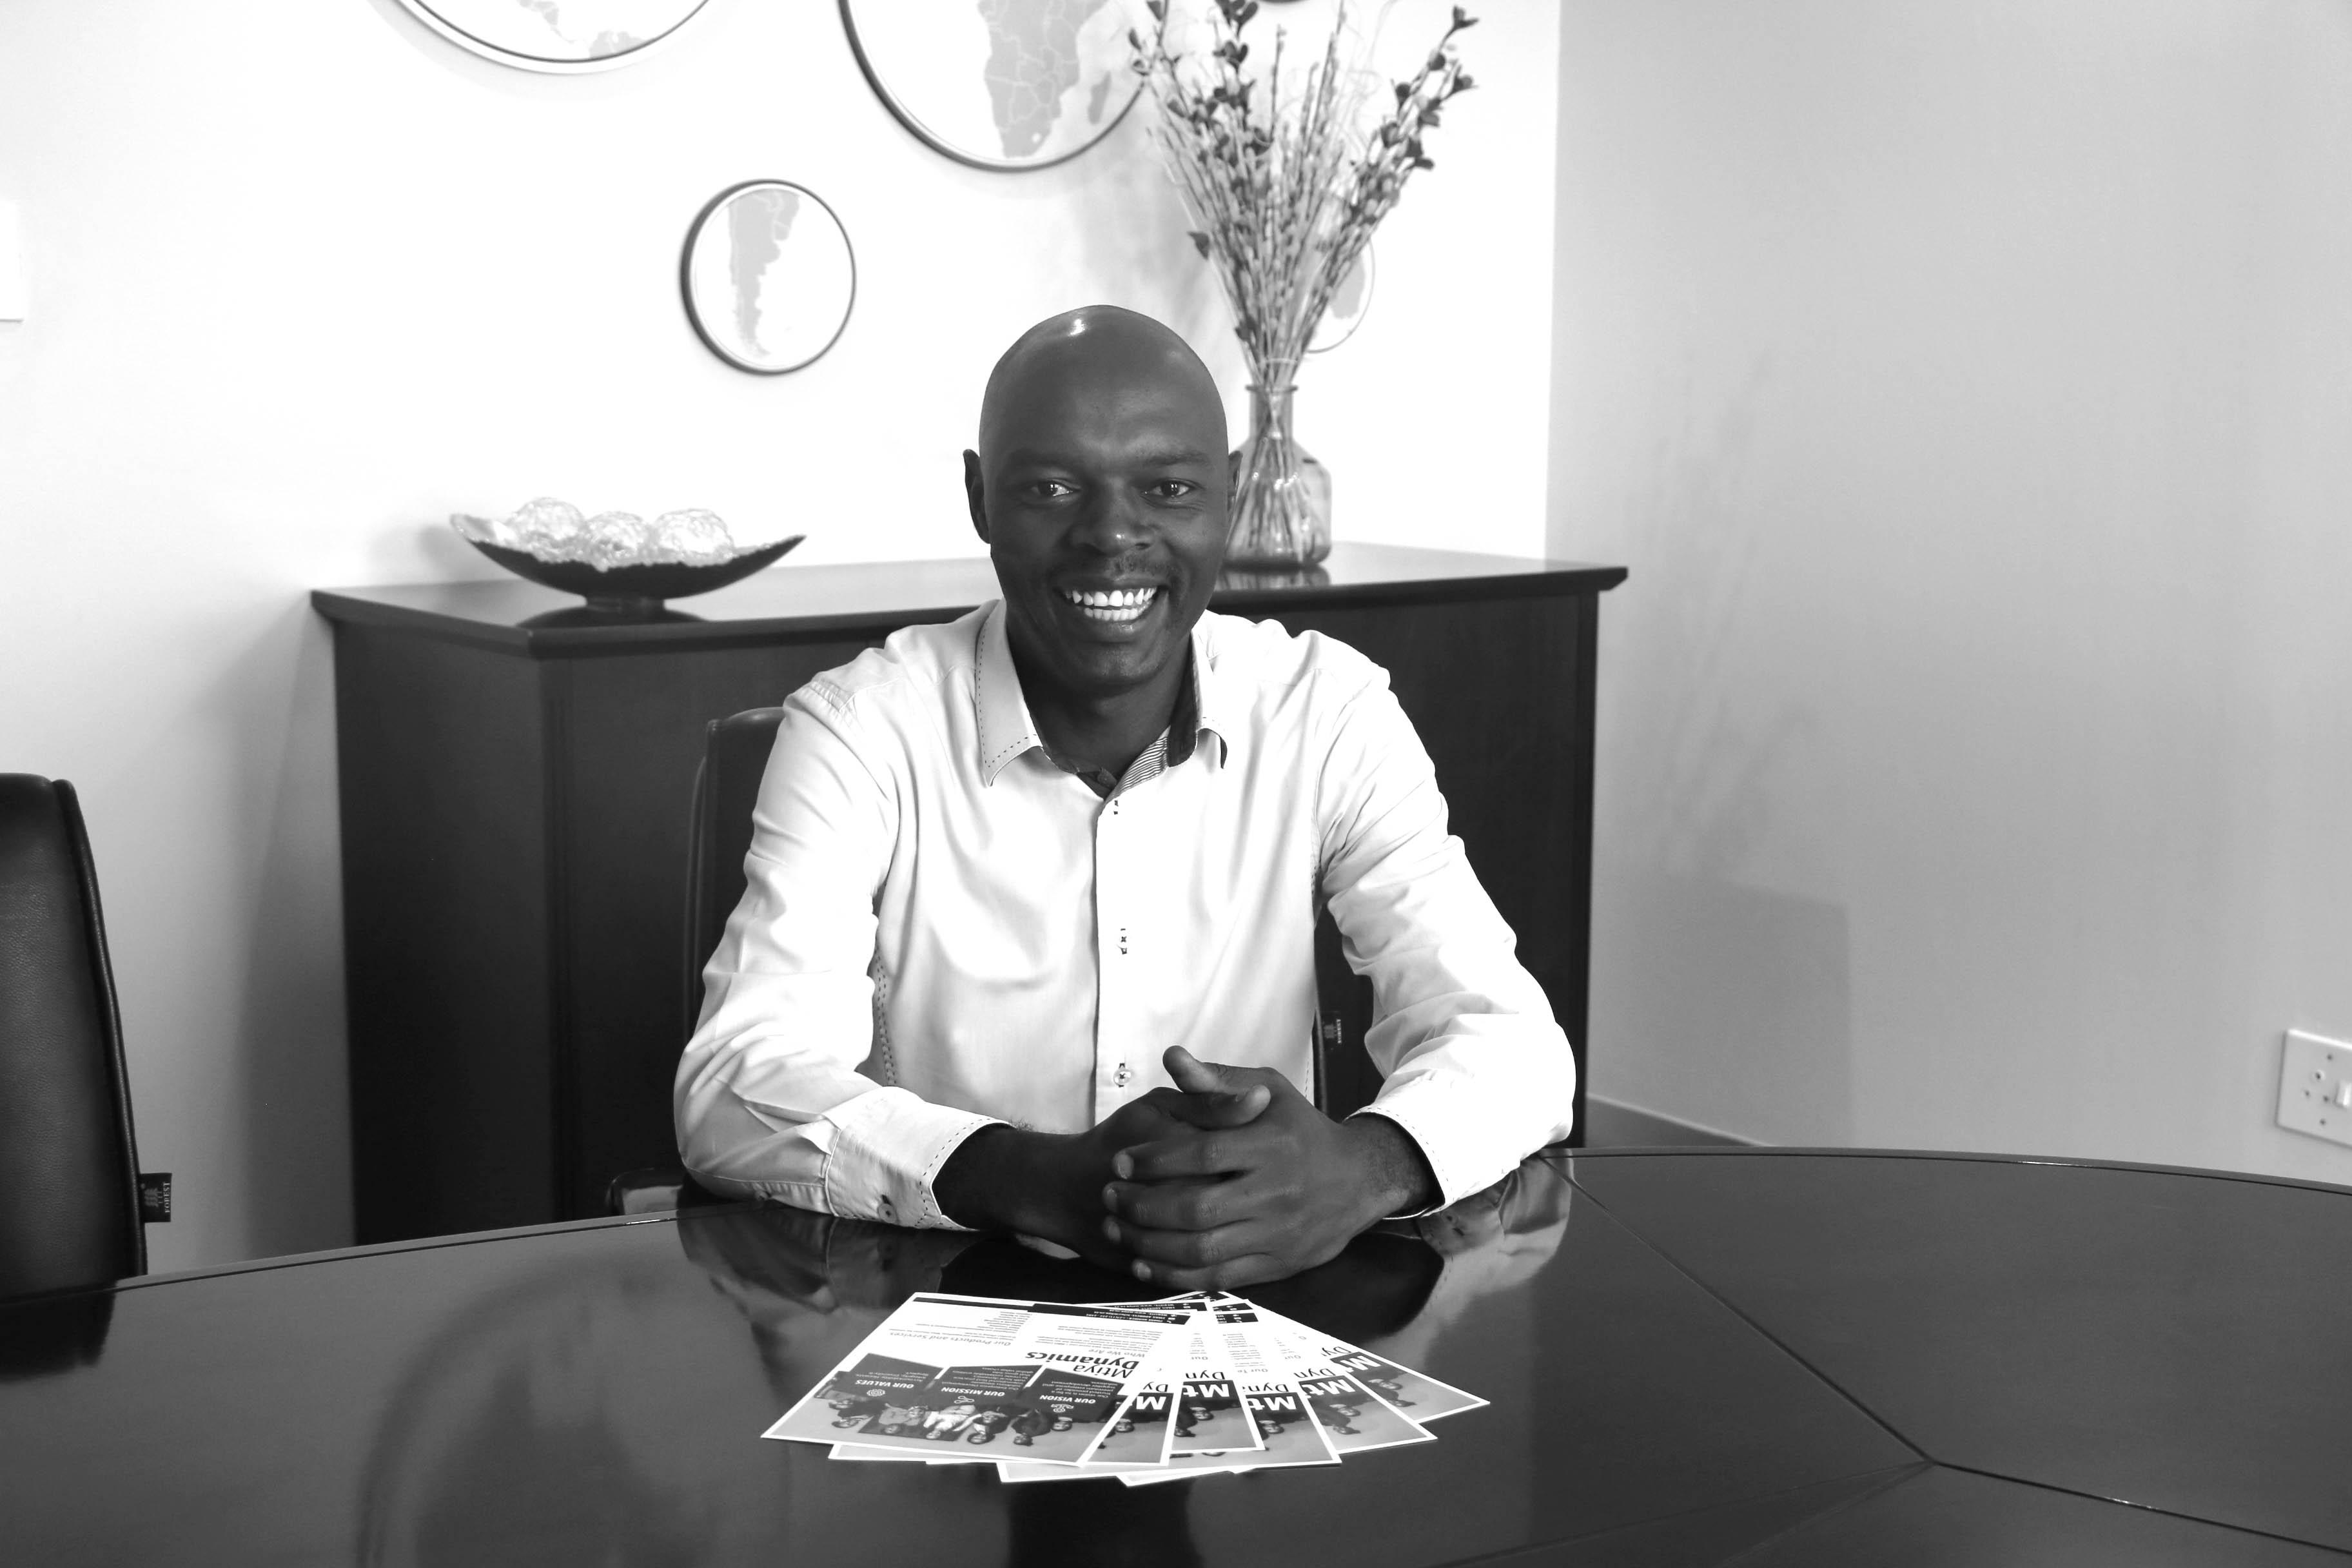 NICHOLAS MOKWEBO